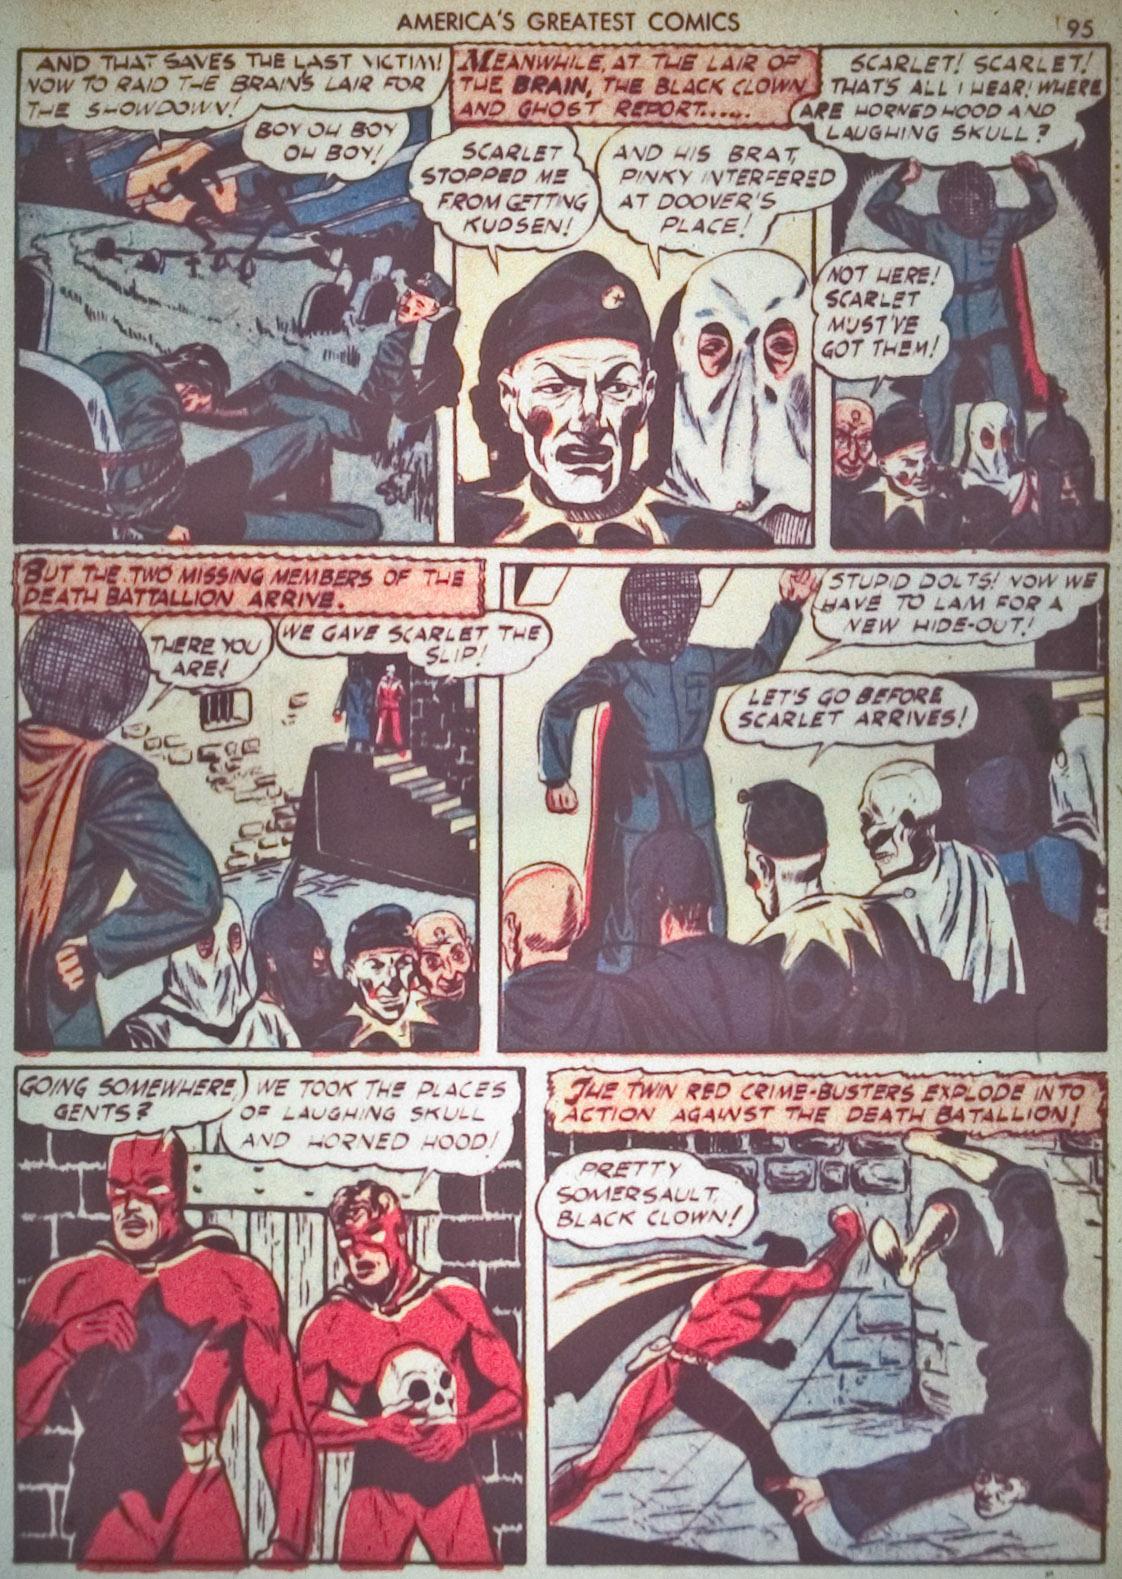 Read online America's Greatest Comics comic -  Issue #1 - 98